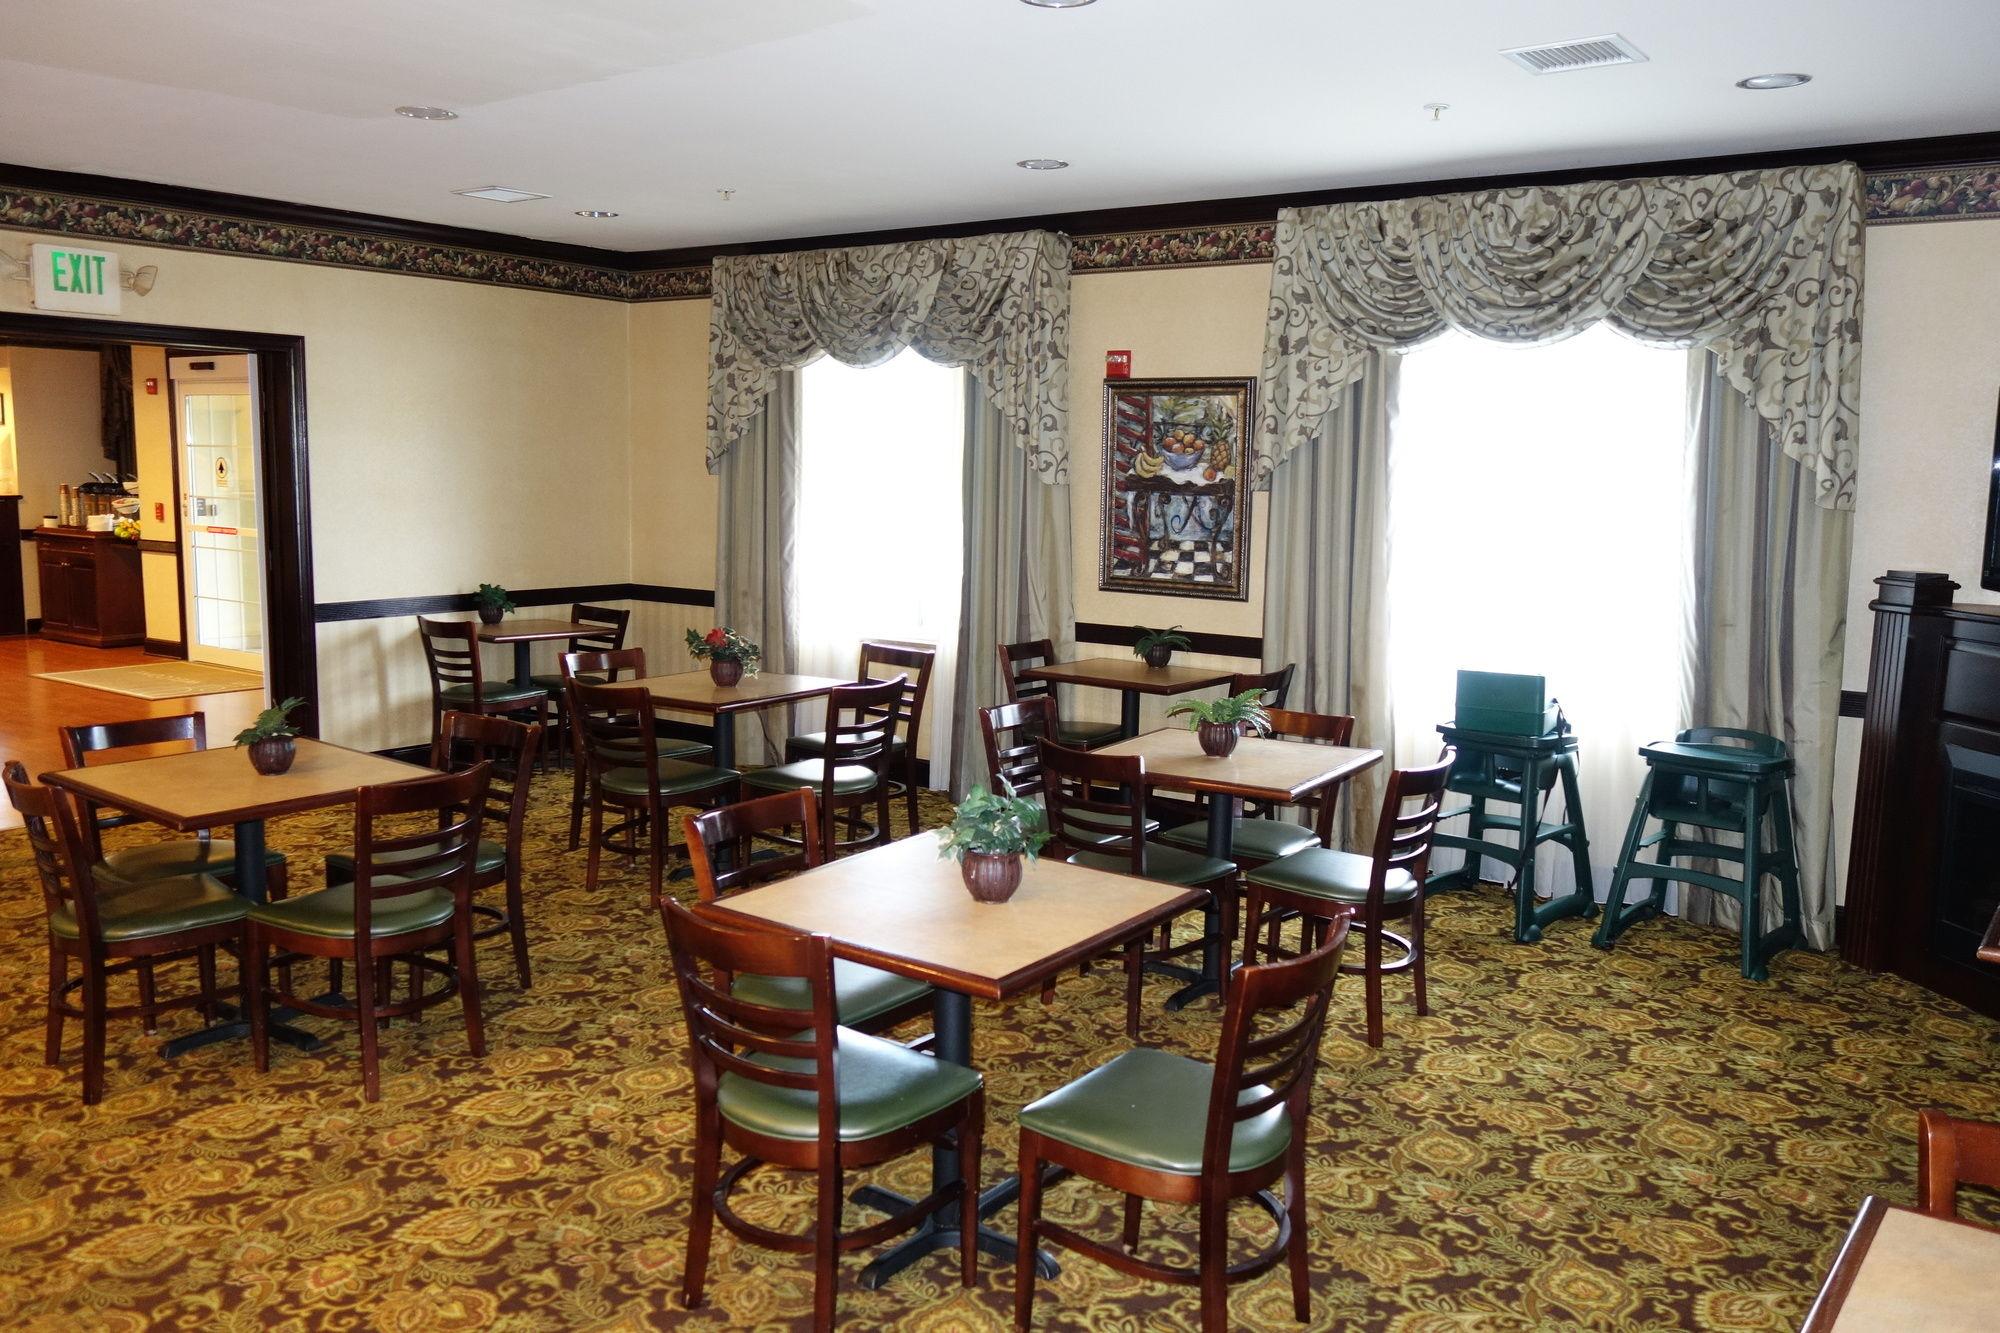 A Romantic Boutique Hotel in Perrysburg, Ohio